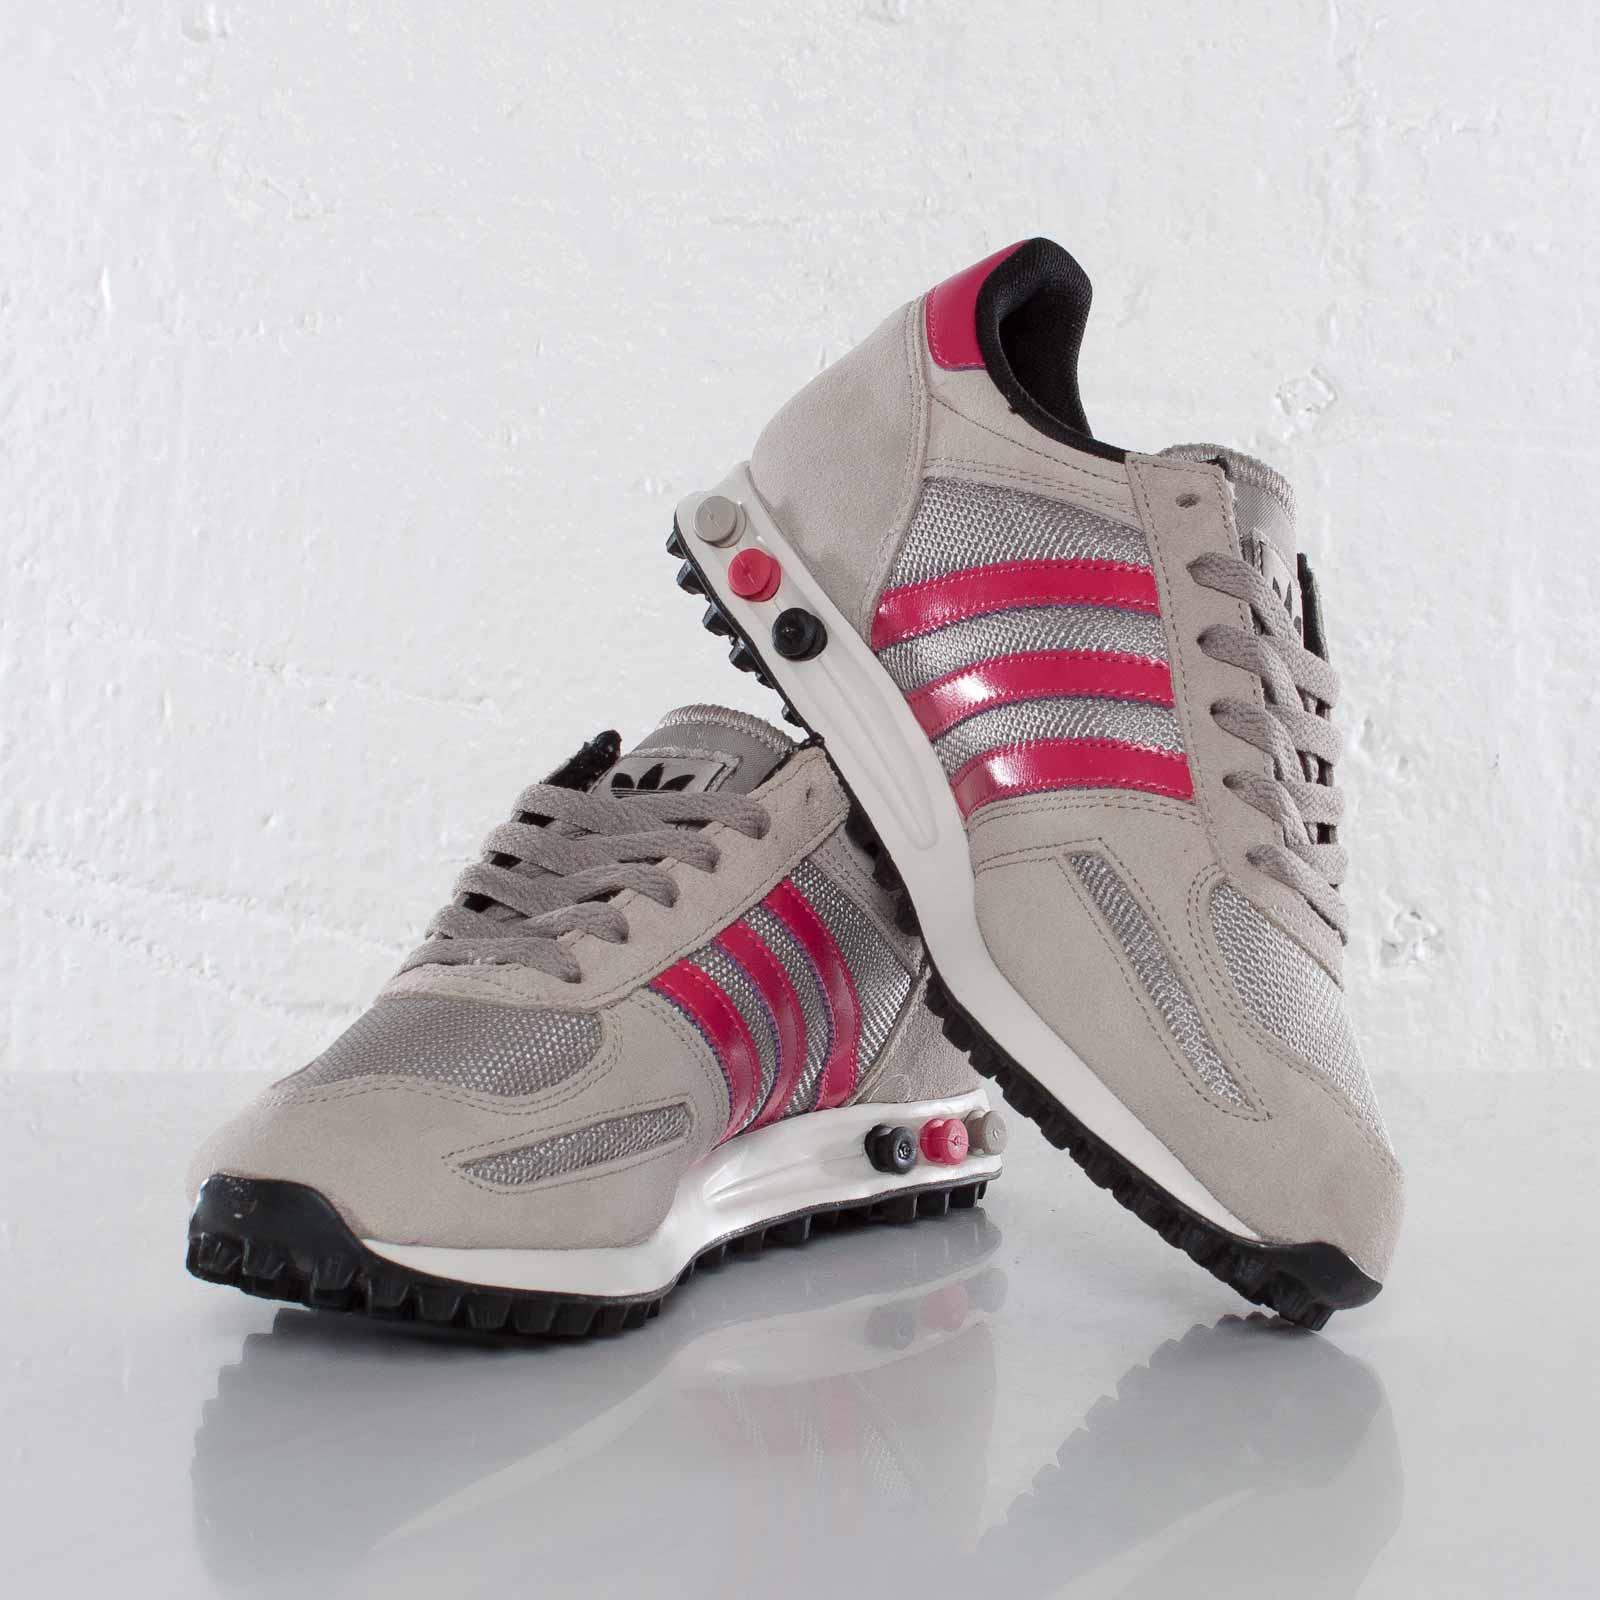 adidas LA Trainer W - Q20688 - SNS | sneakers & streetwear online ...